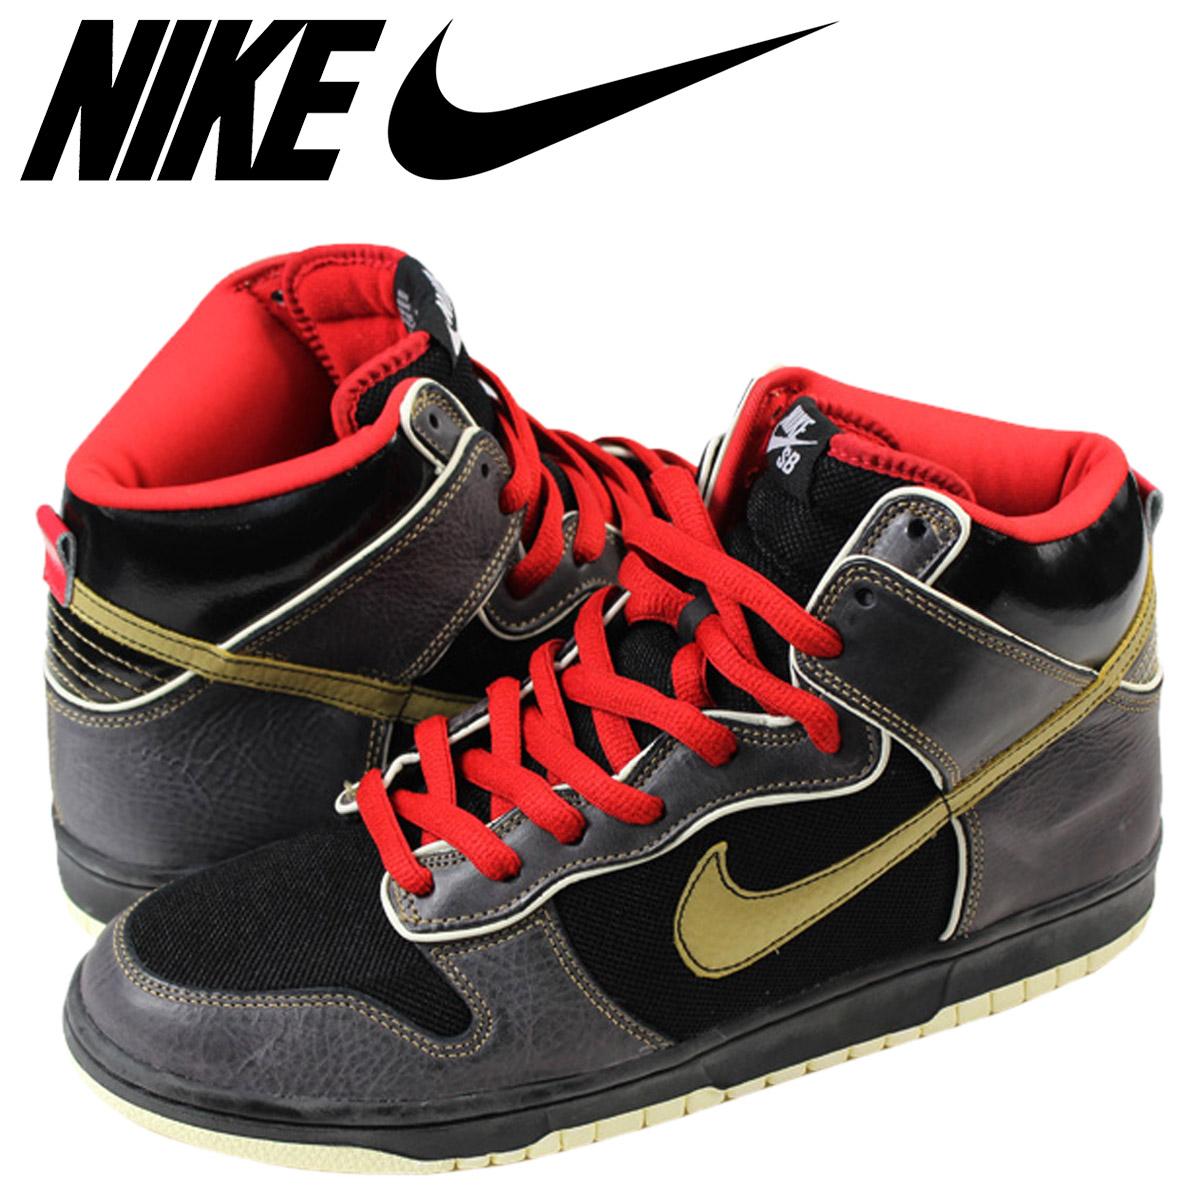 b4f1723b66193 ... sneakers new action greennike basketball shoe 04b15 8d759  denmark nike  sb marshall amps for sale fd8c8 6492a